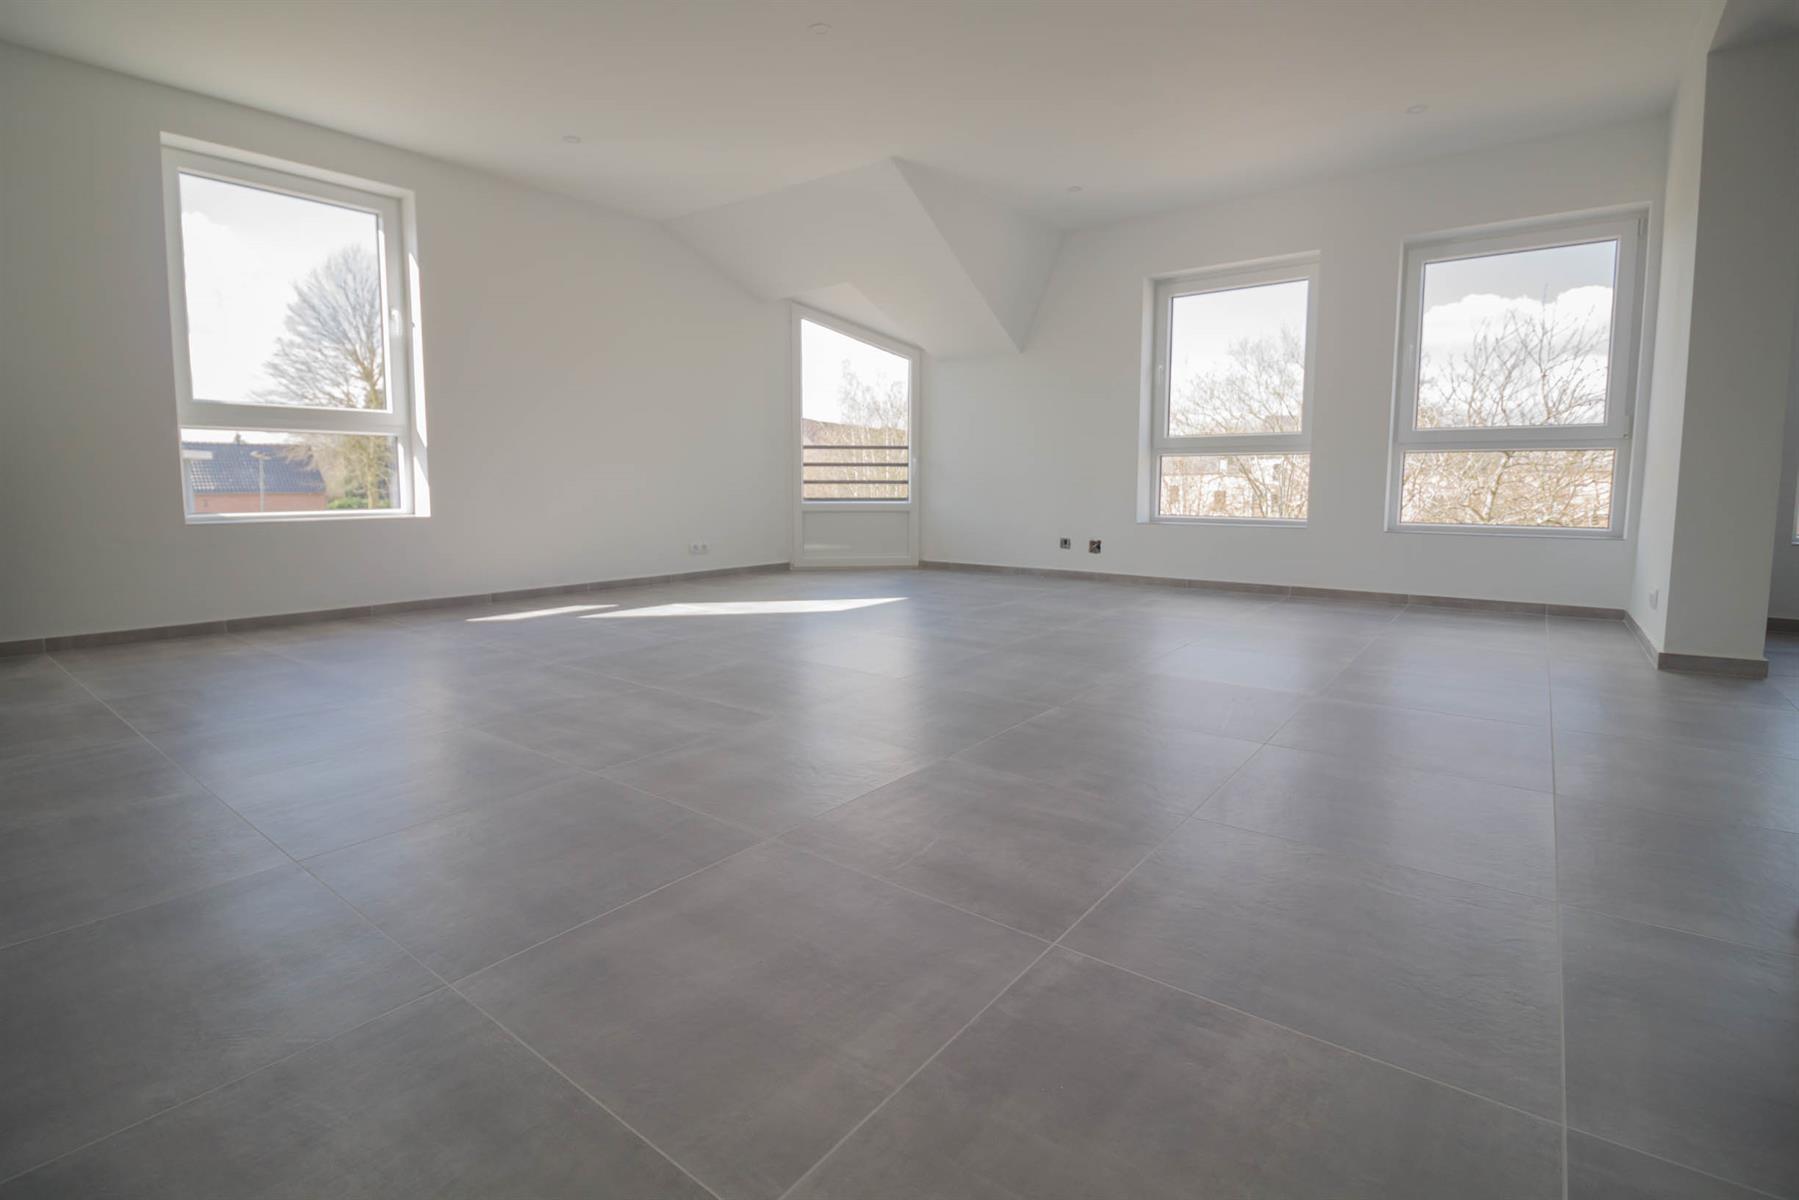 Appartement - Peissant - #4321179-4